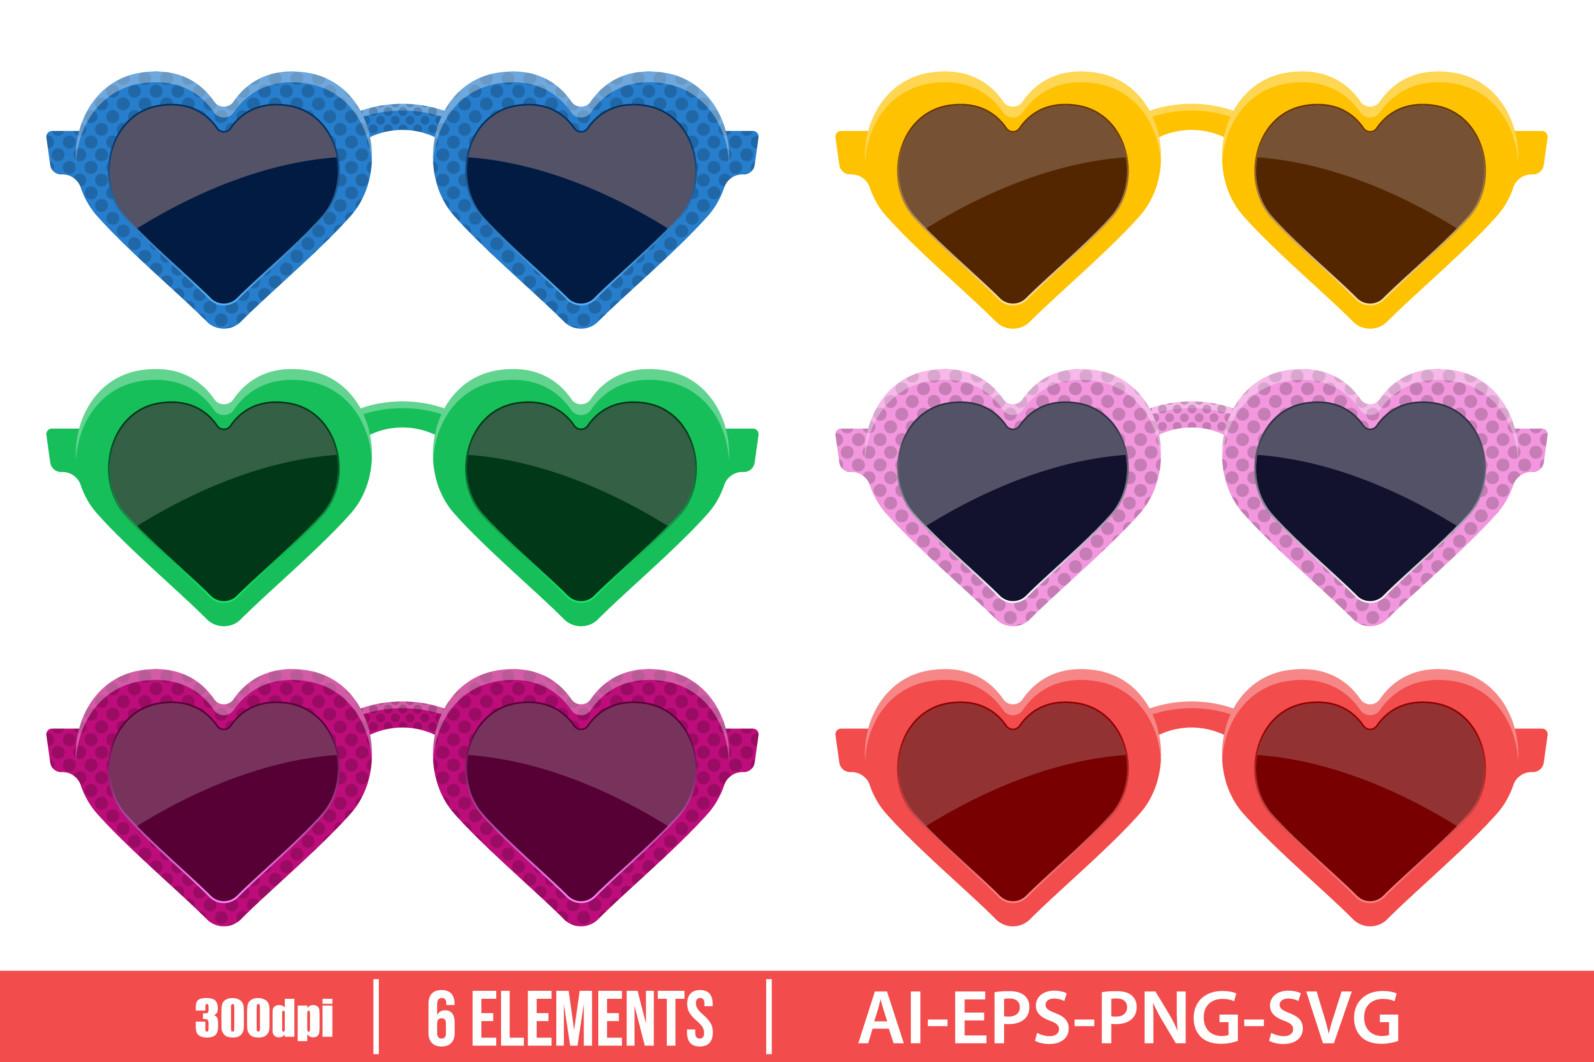 Stylish heart sunglasses clipart vector design illustration. Sunglasses set. Vector Clipart Print - HEART SHAPED SUNGLASSES scaled -